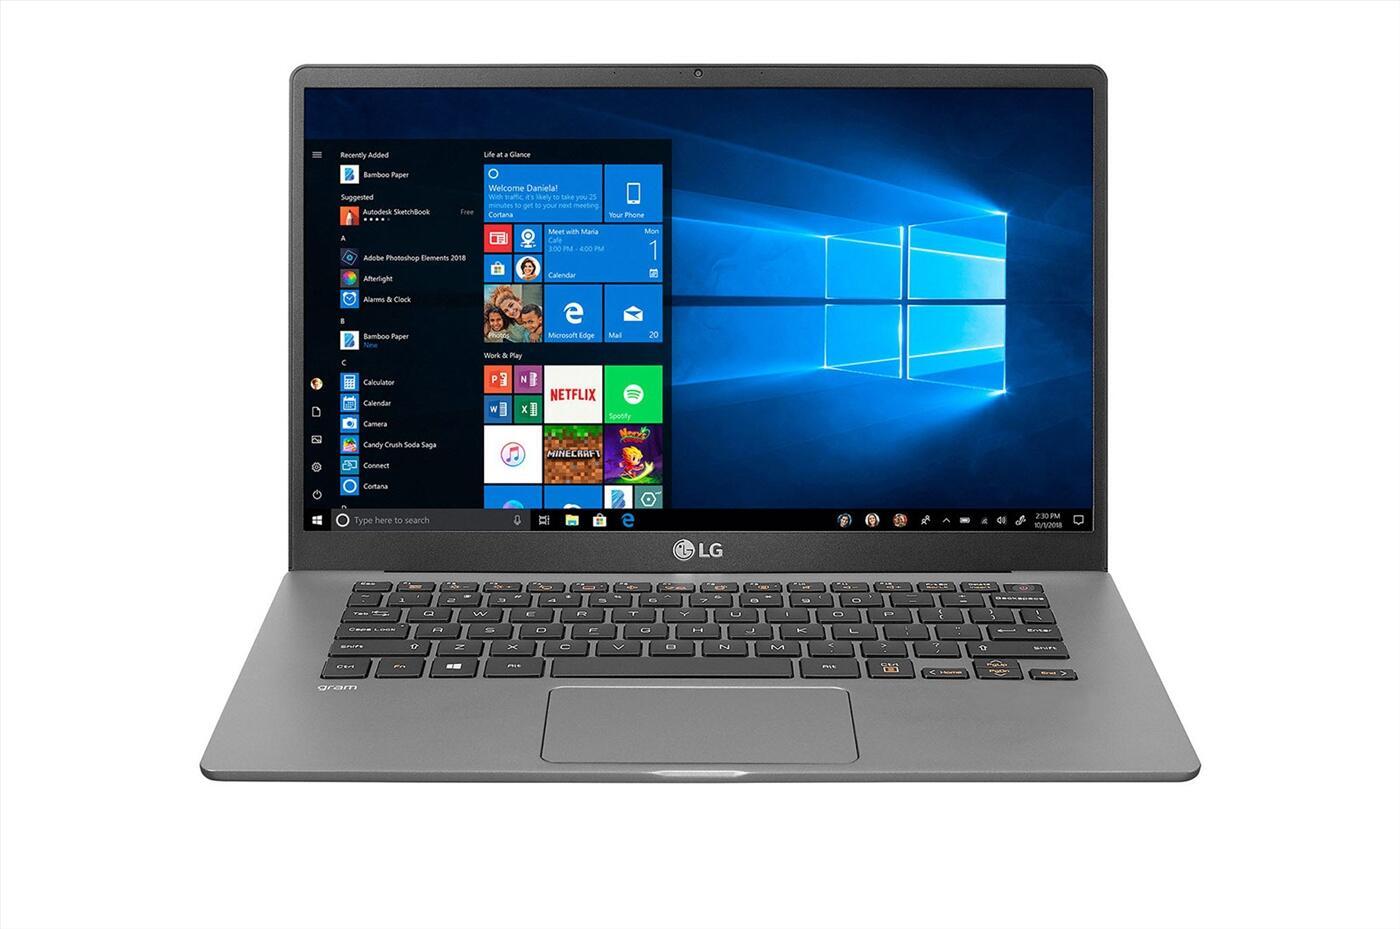 Laptop LG gram 14Z90N-V.AR52A5 Xám trắng (Cpu i5 - 1035G7, Ram 8GD4 , 256 G SSD M.2, 14 inch FHD